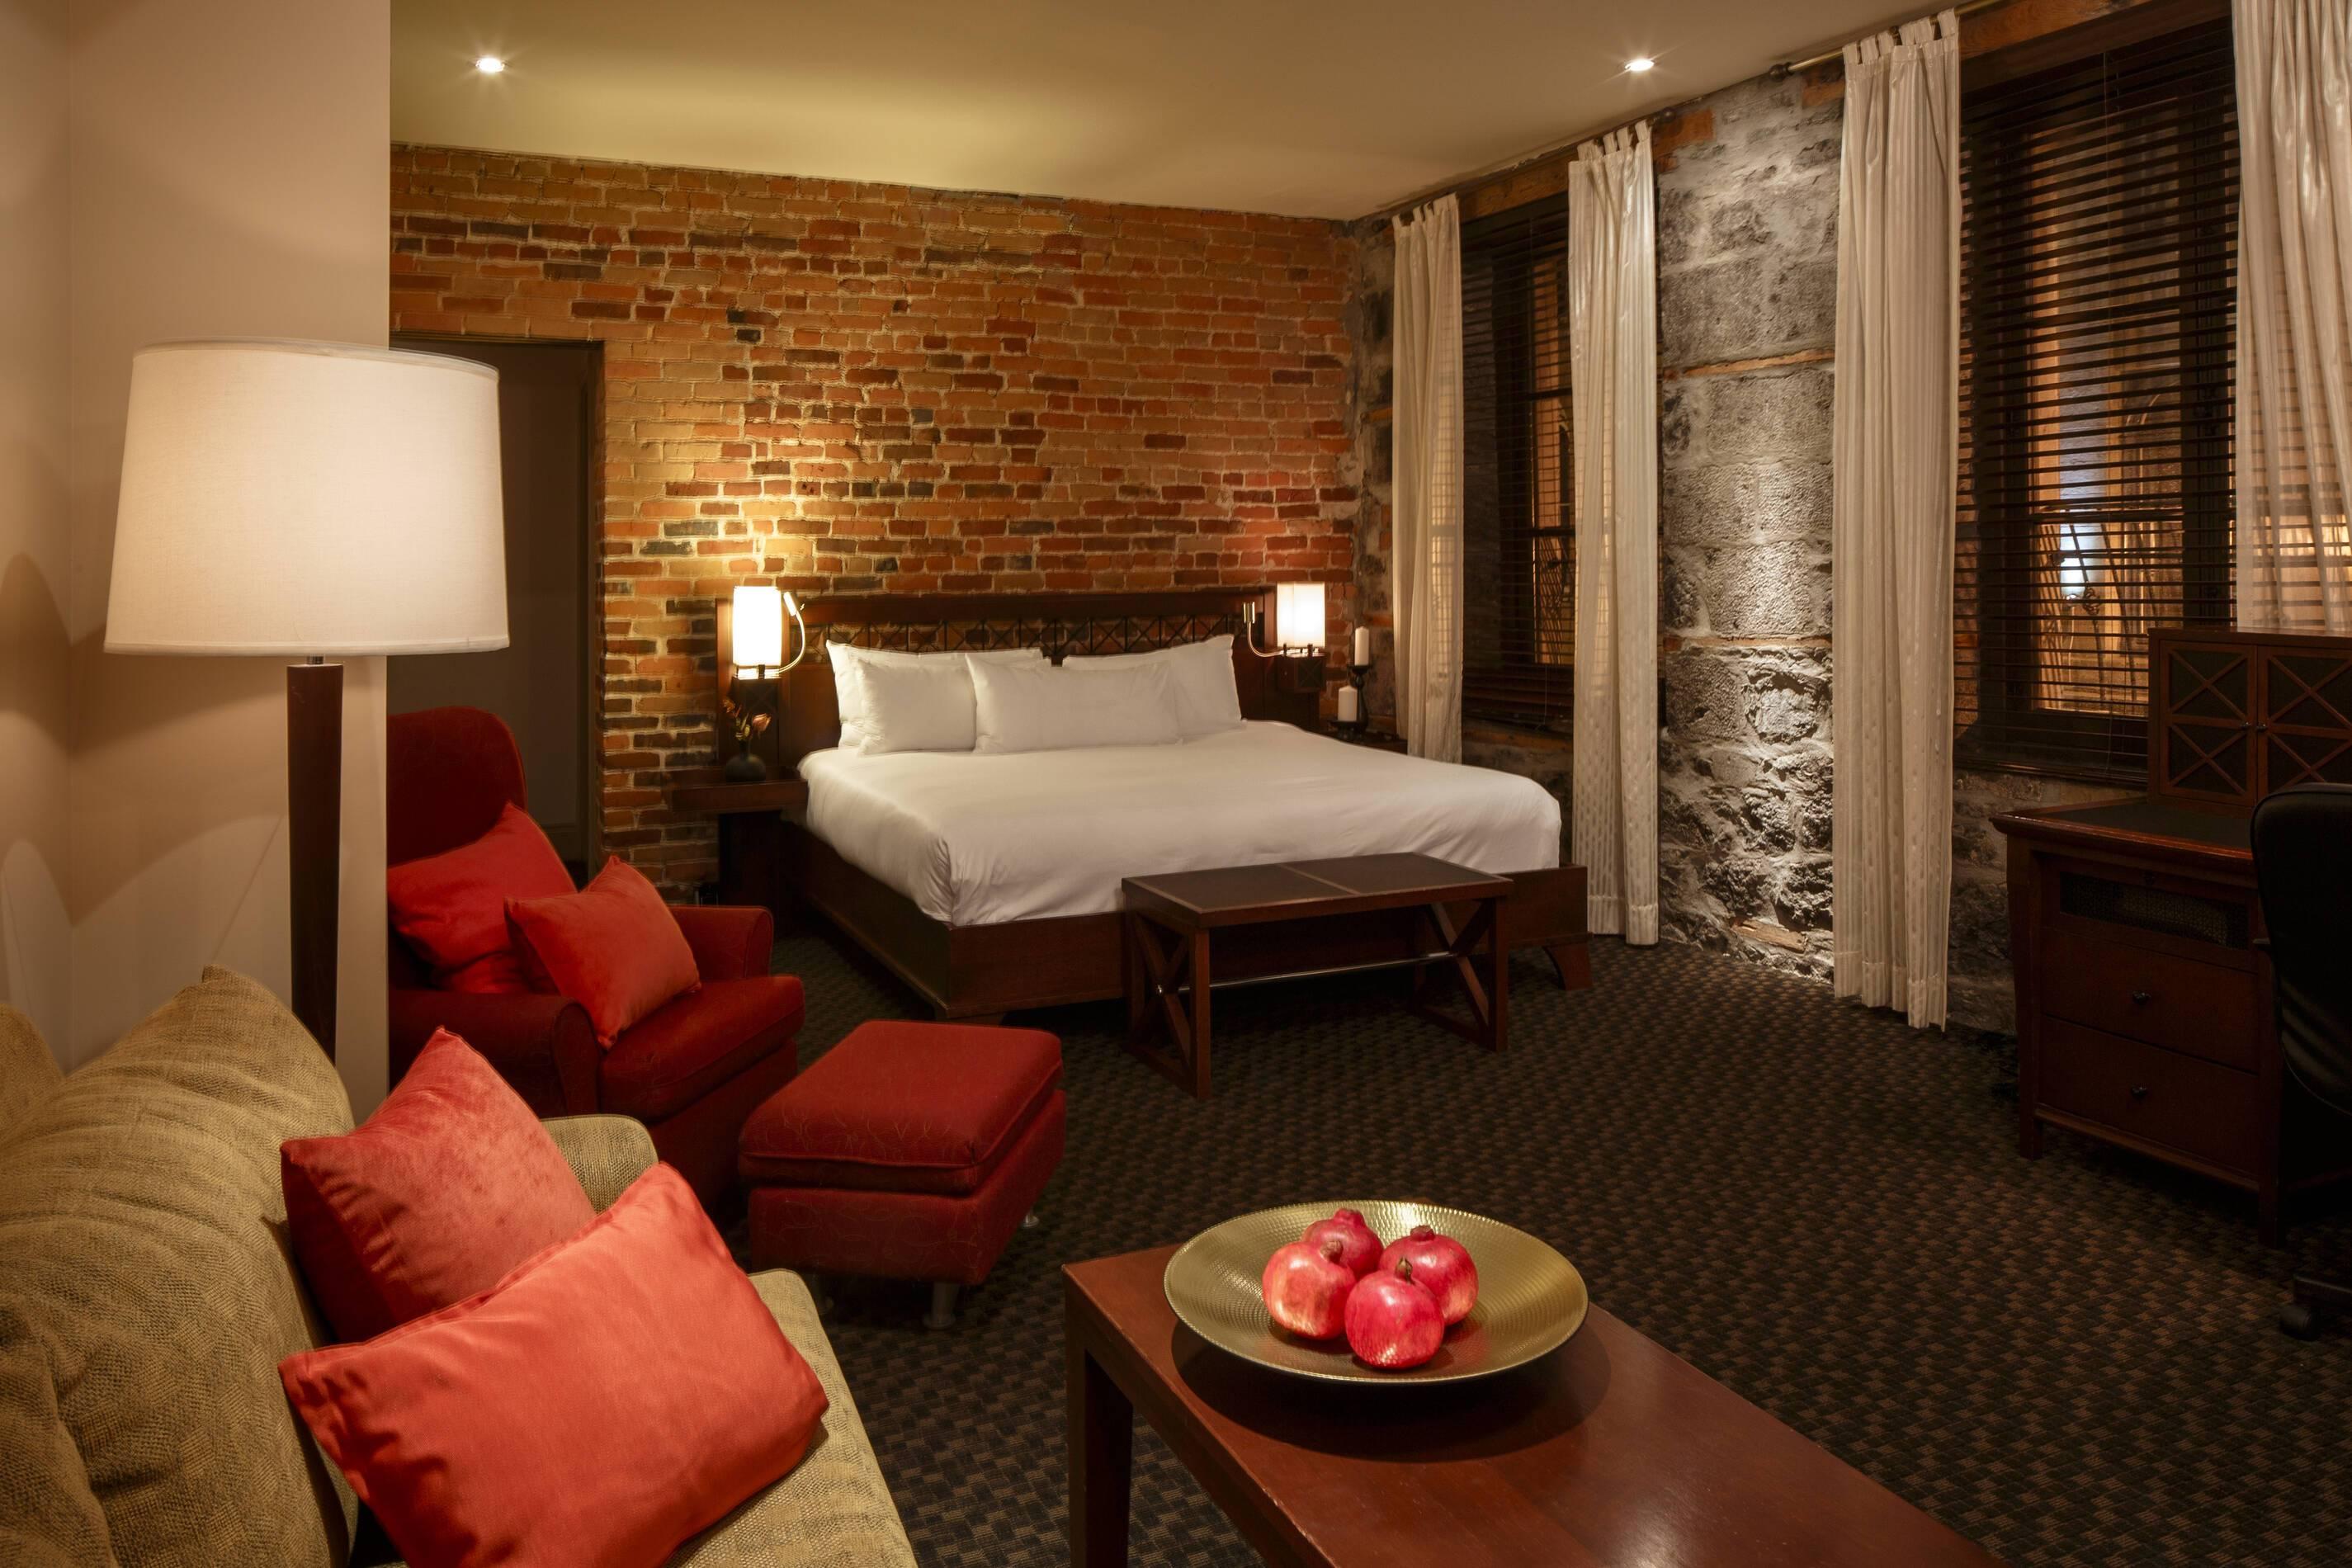 Montreal Quebec Canada Hotel Nelligan Chambre